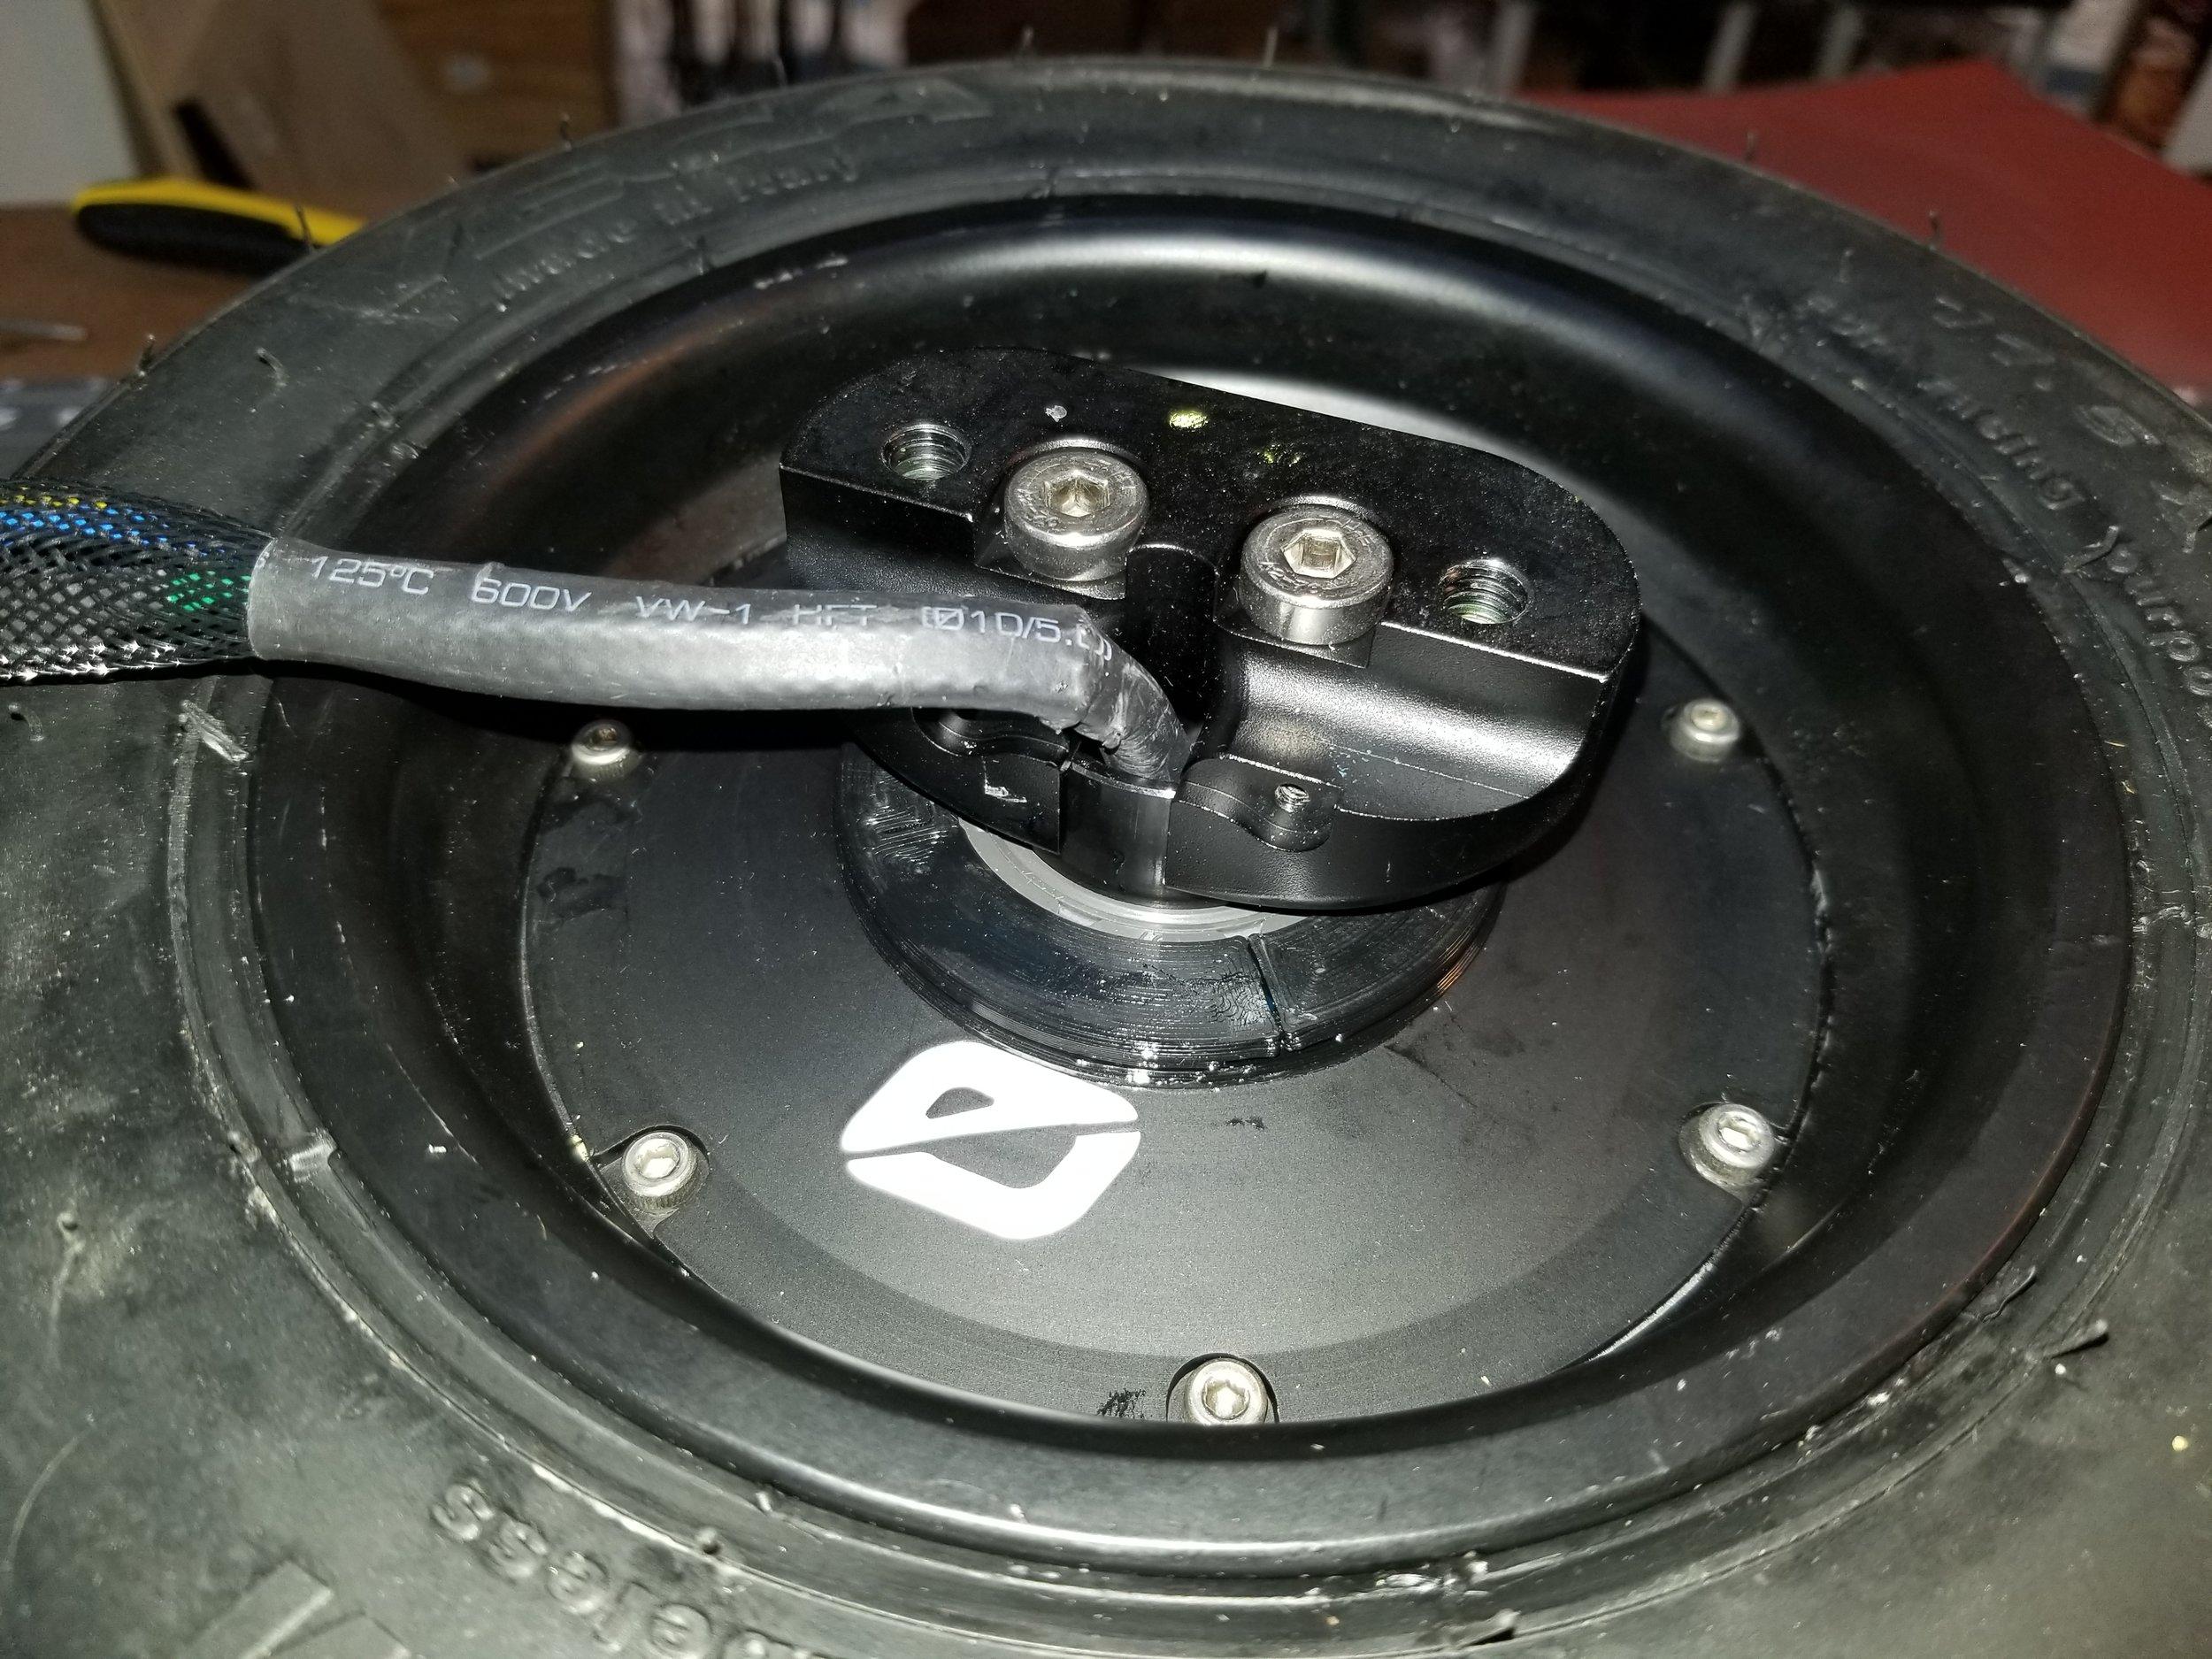 Axle caps back on